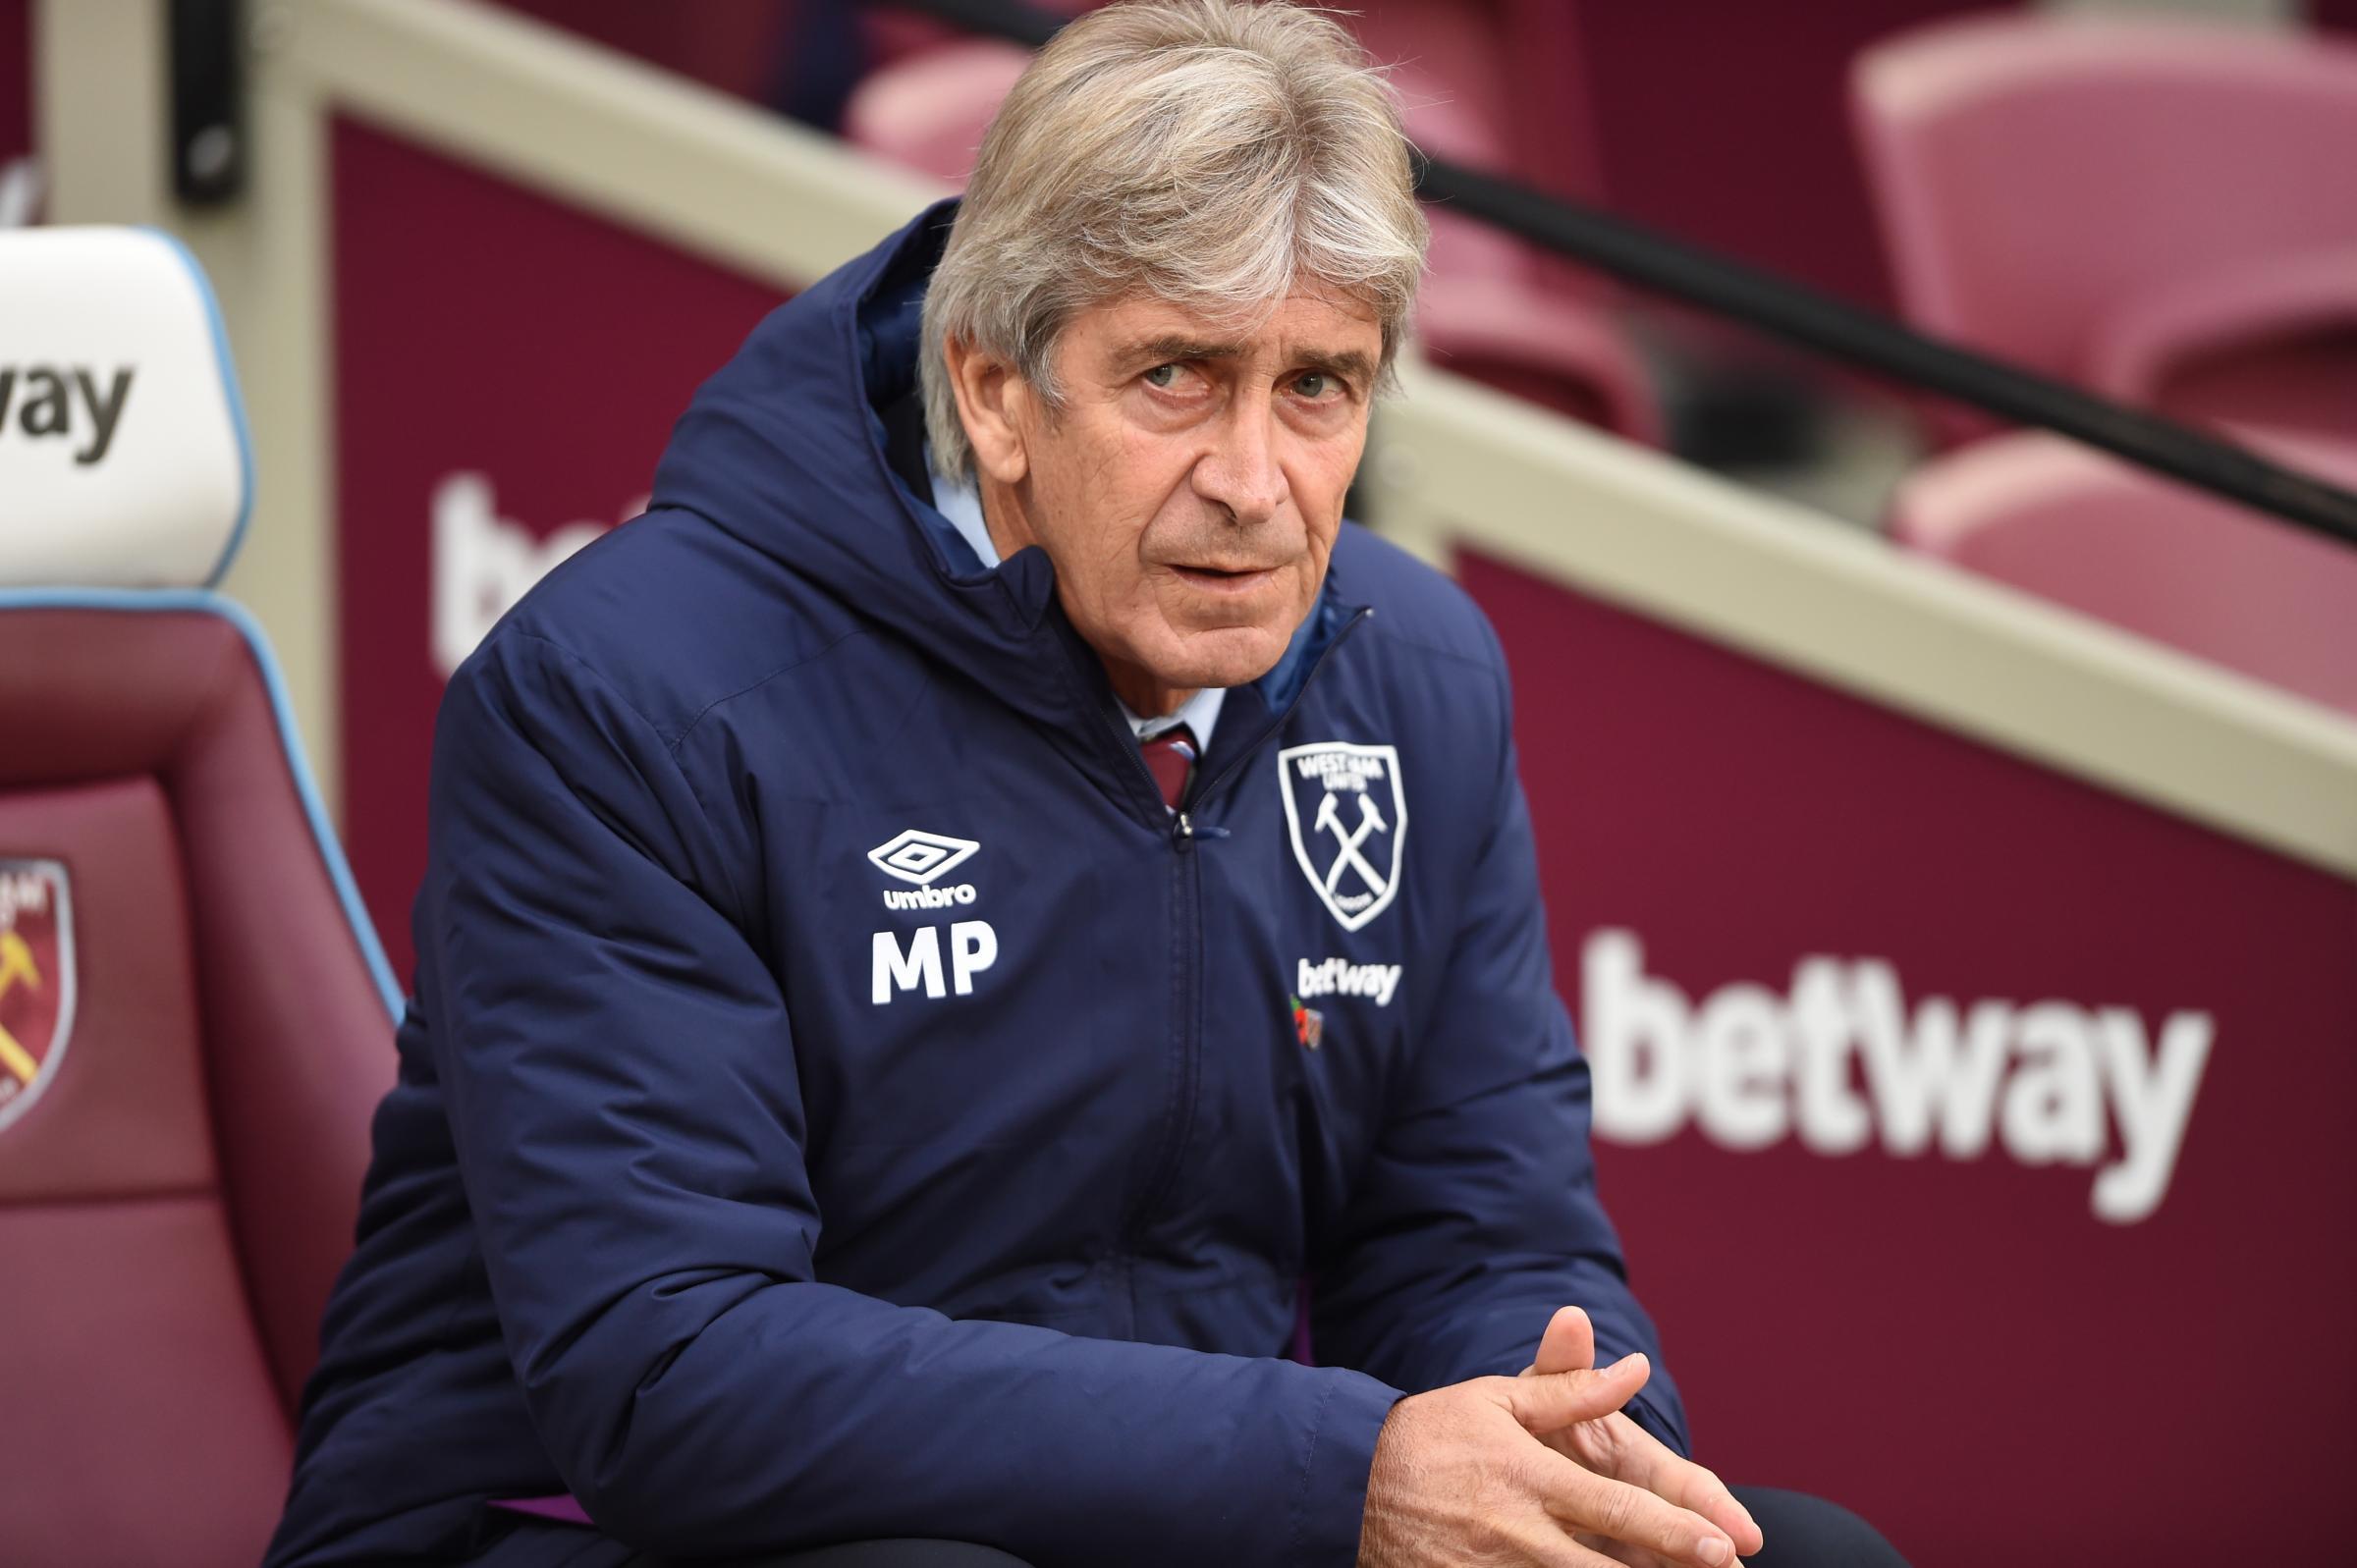 West Ham boss insists pressure is normal ahead of Burnley